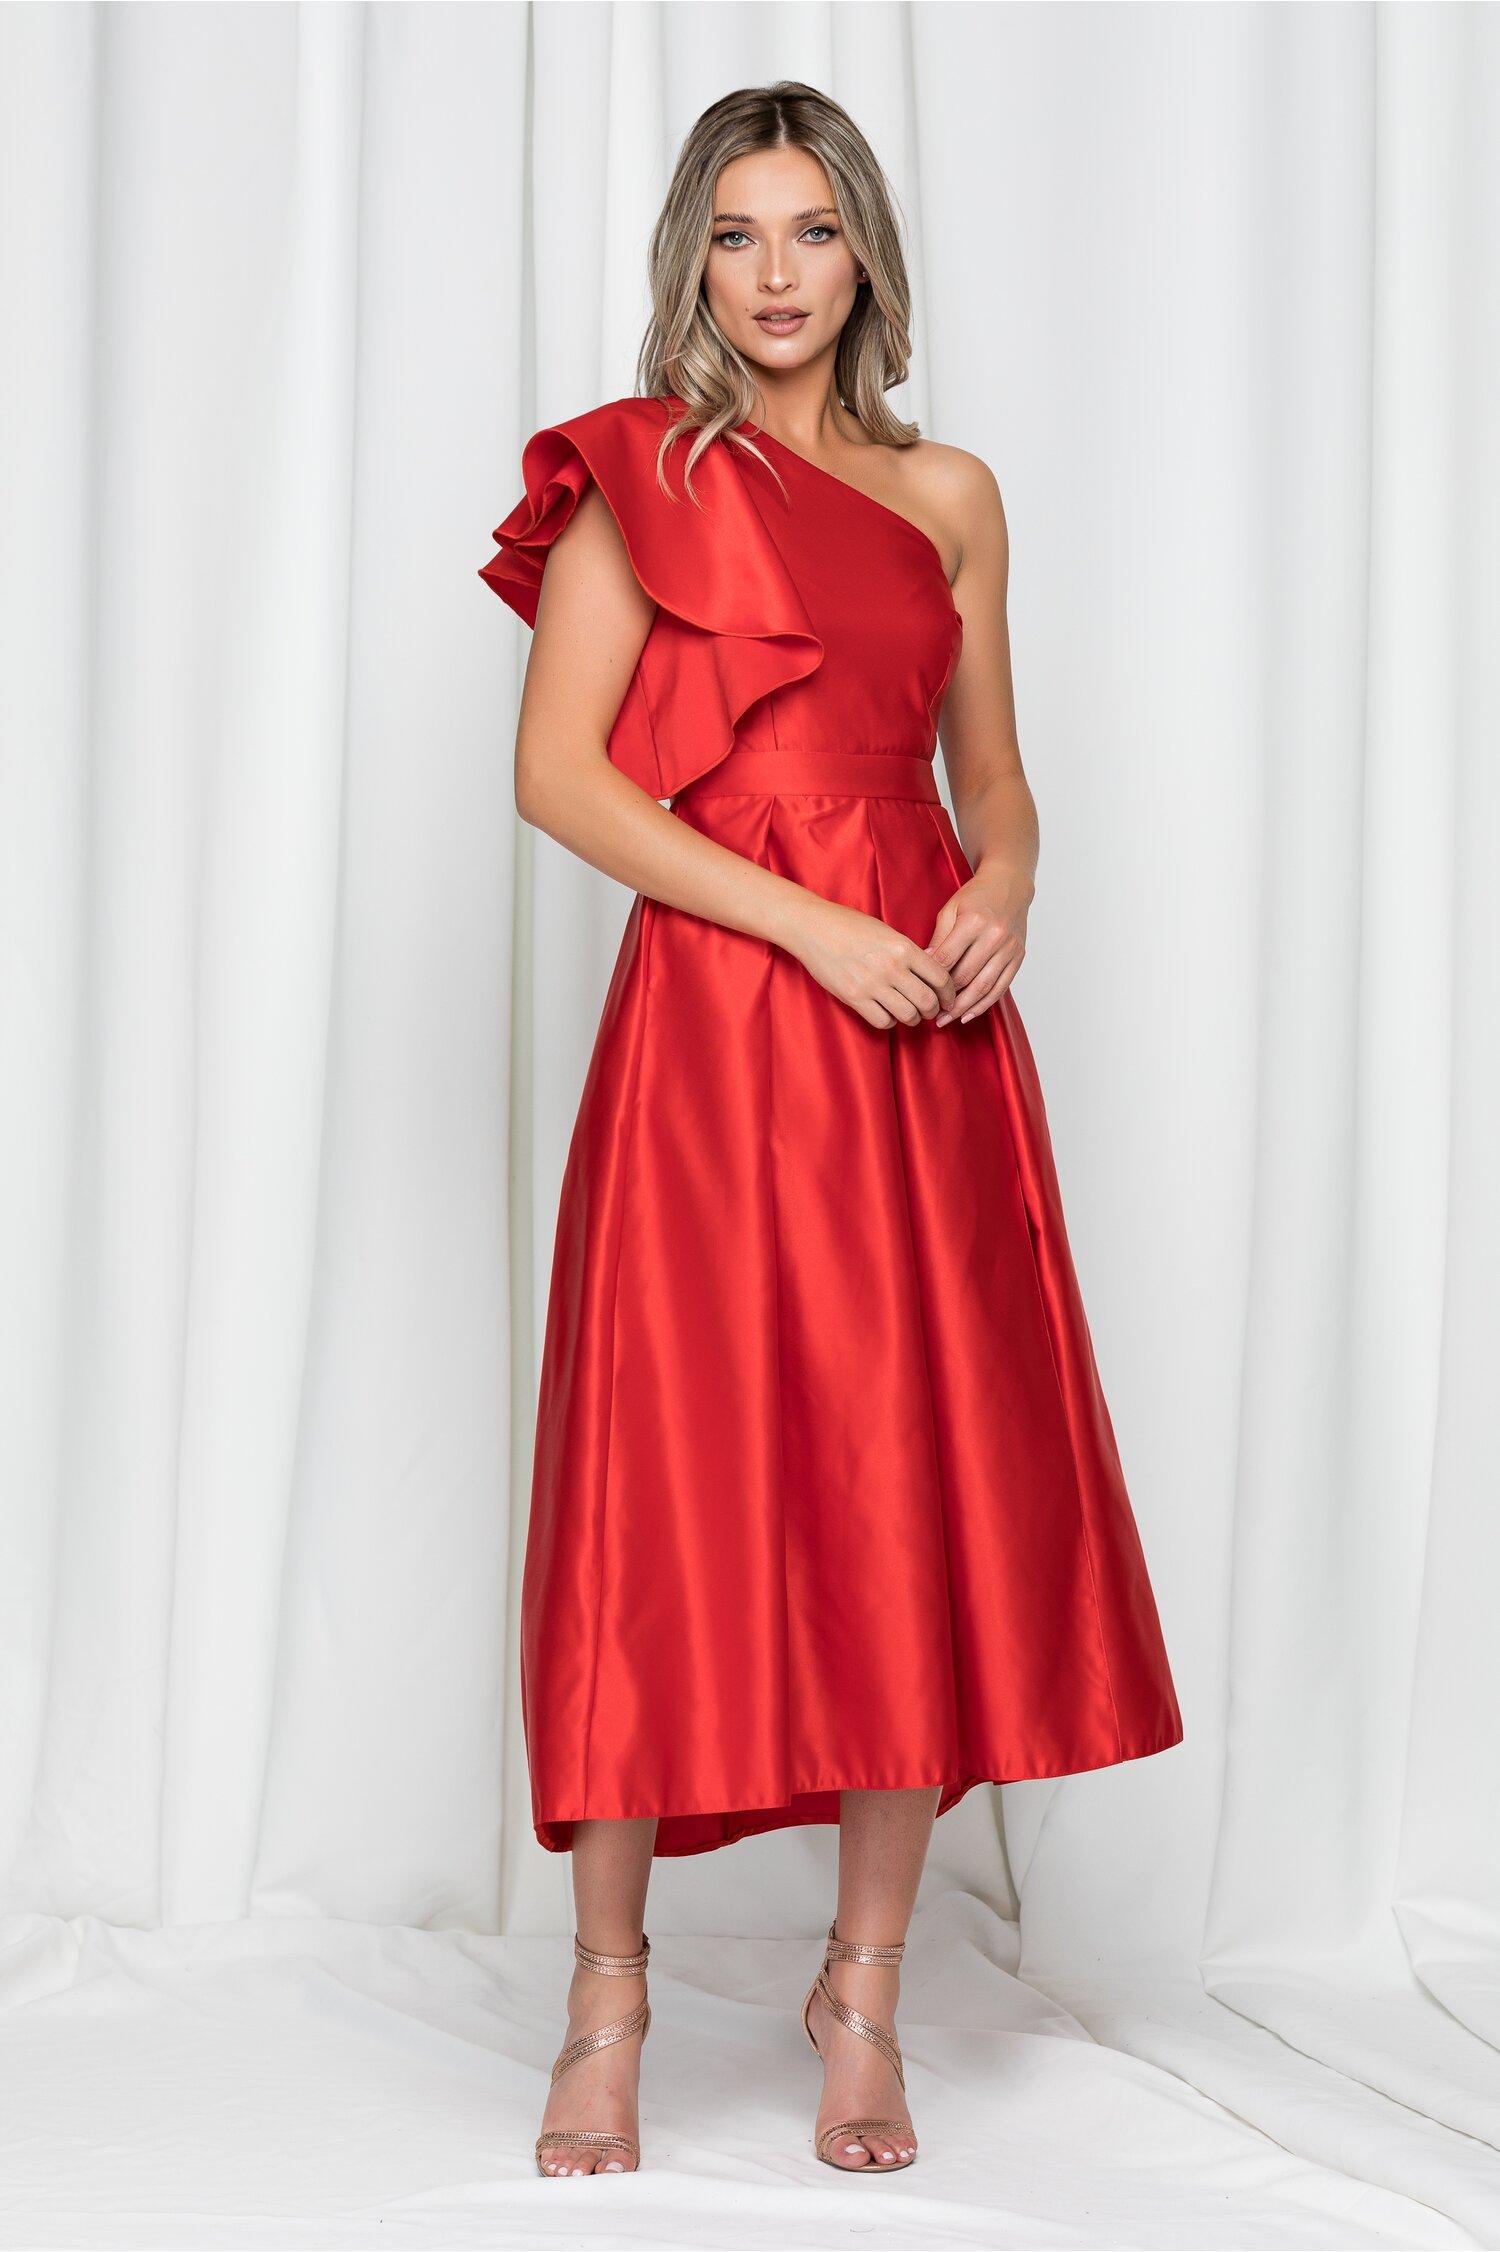 Rochie Moze rosie cu pliuri mari pe fusta si un umar gol